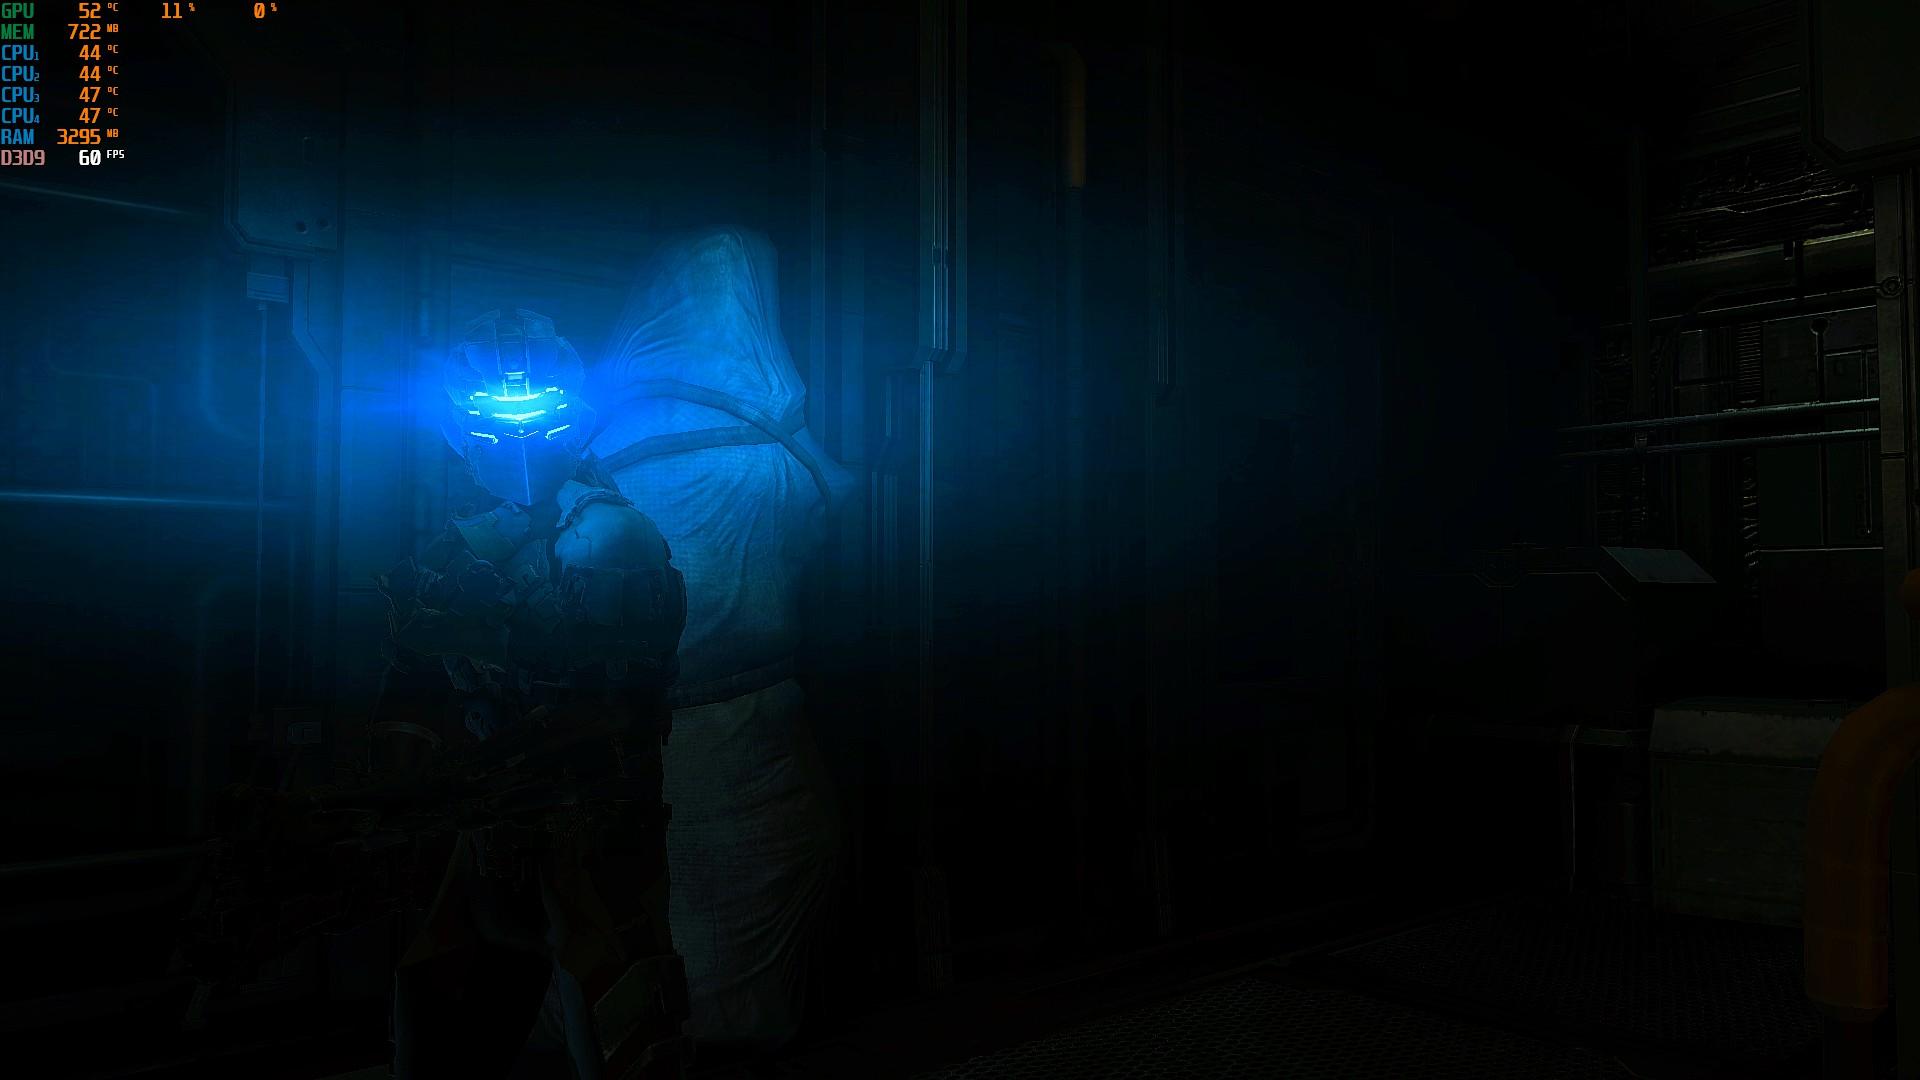 00014.Jpg - Dead Space 2